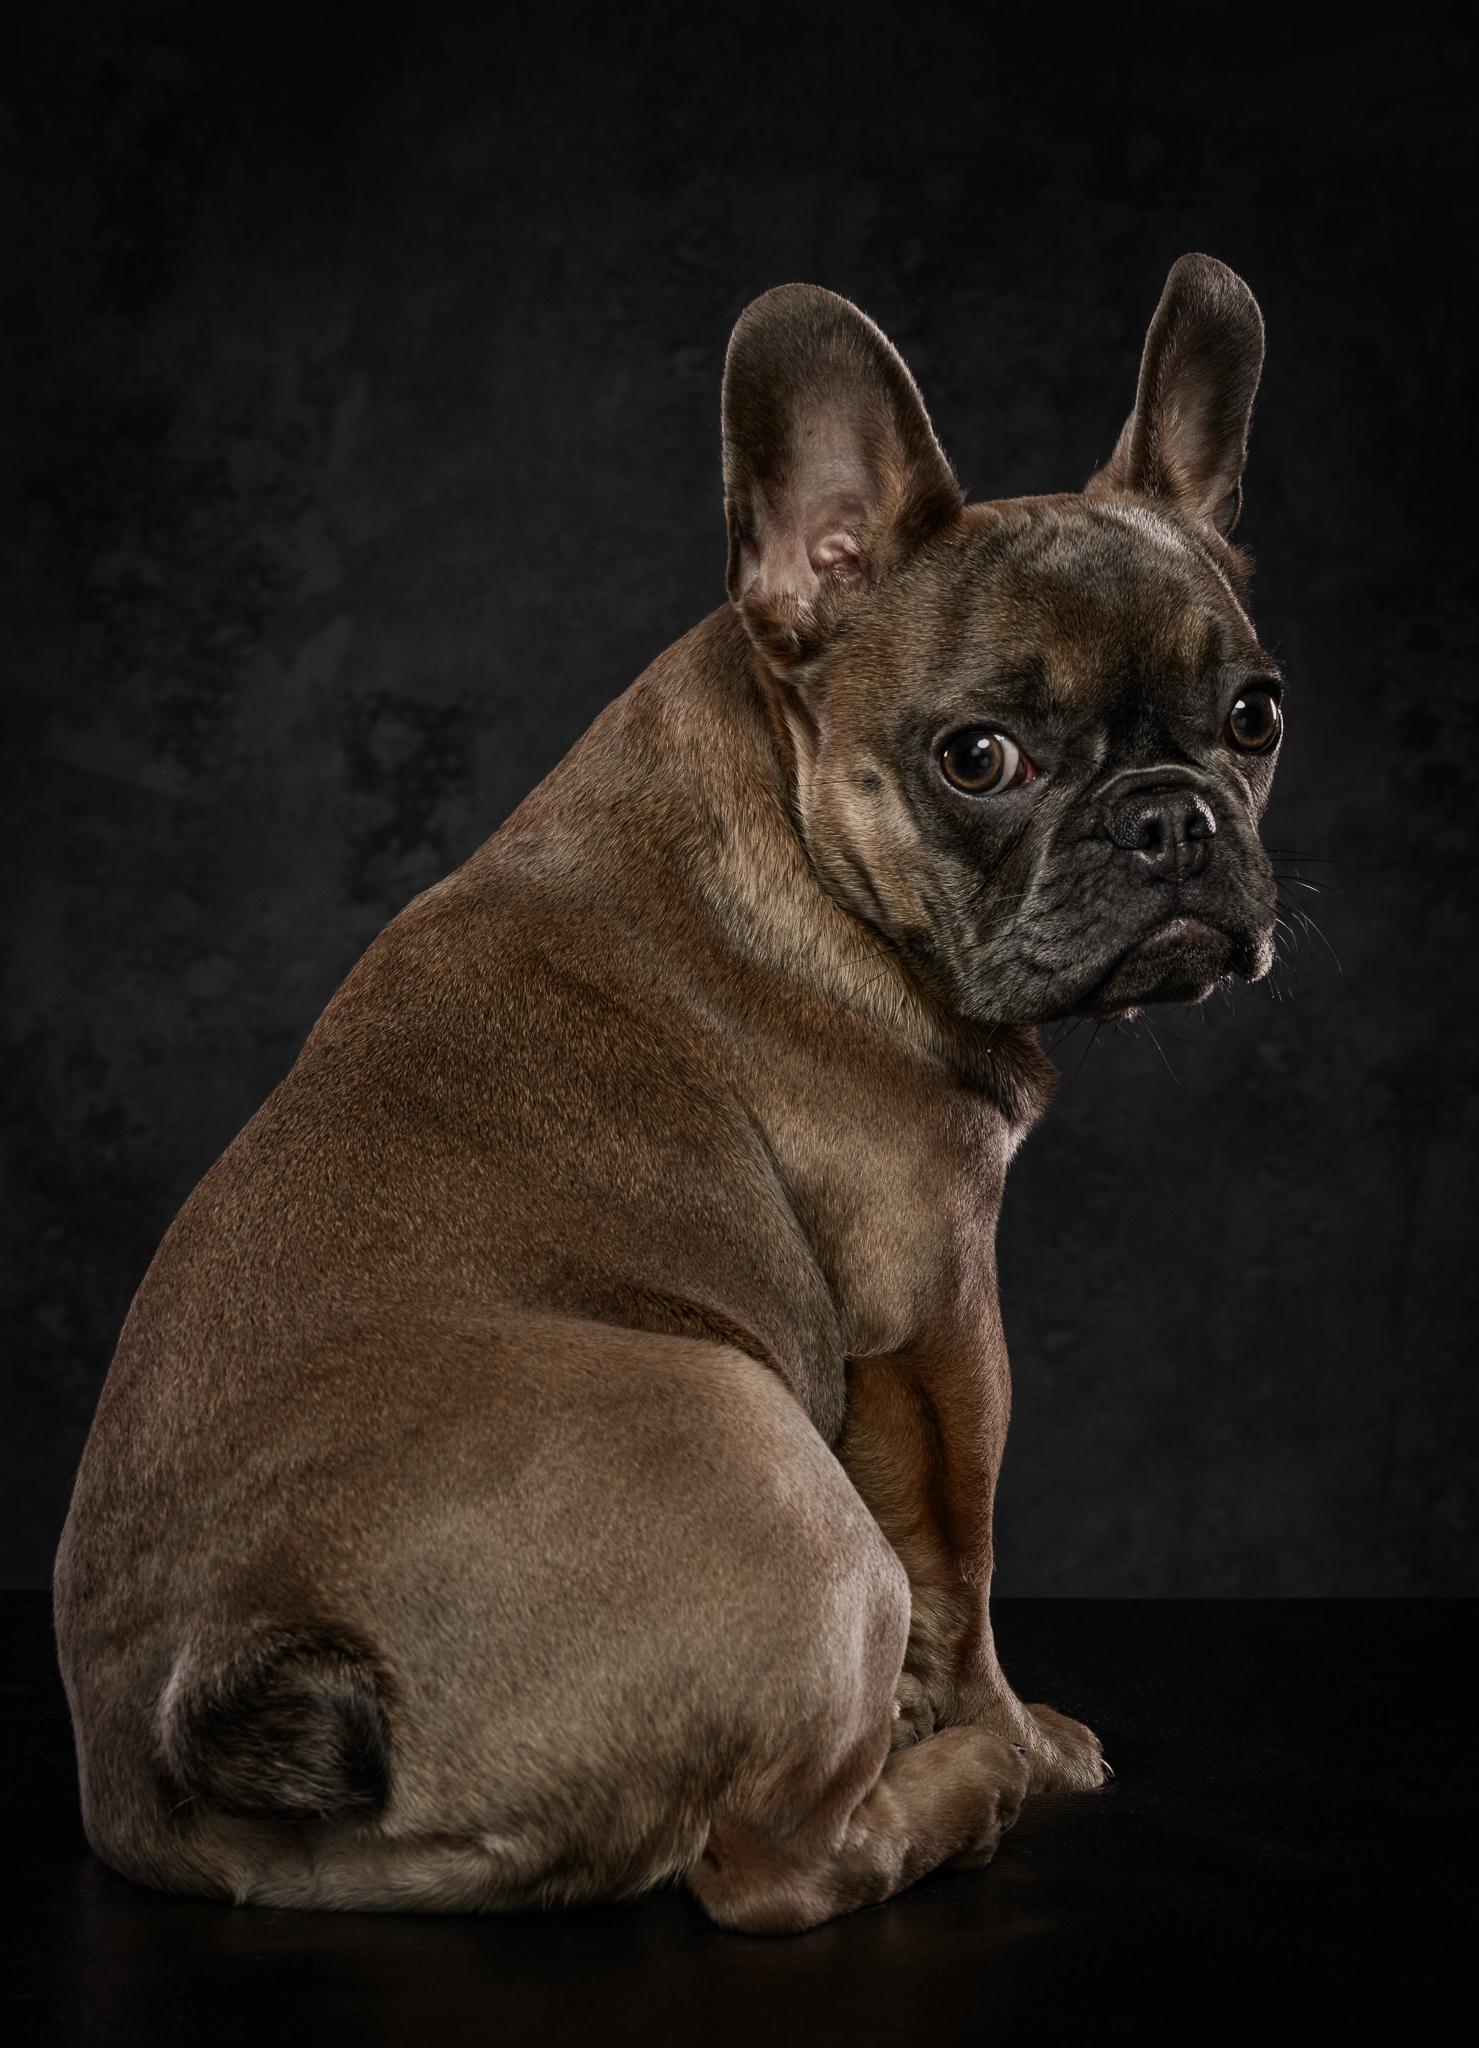 dog-photography-klaus-dyba-3.jpg